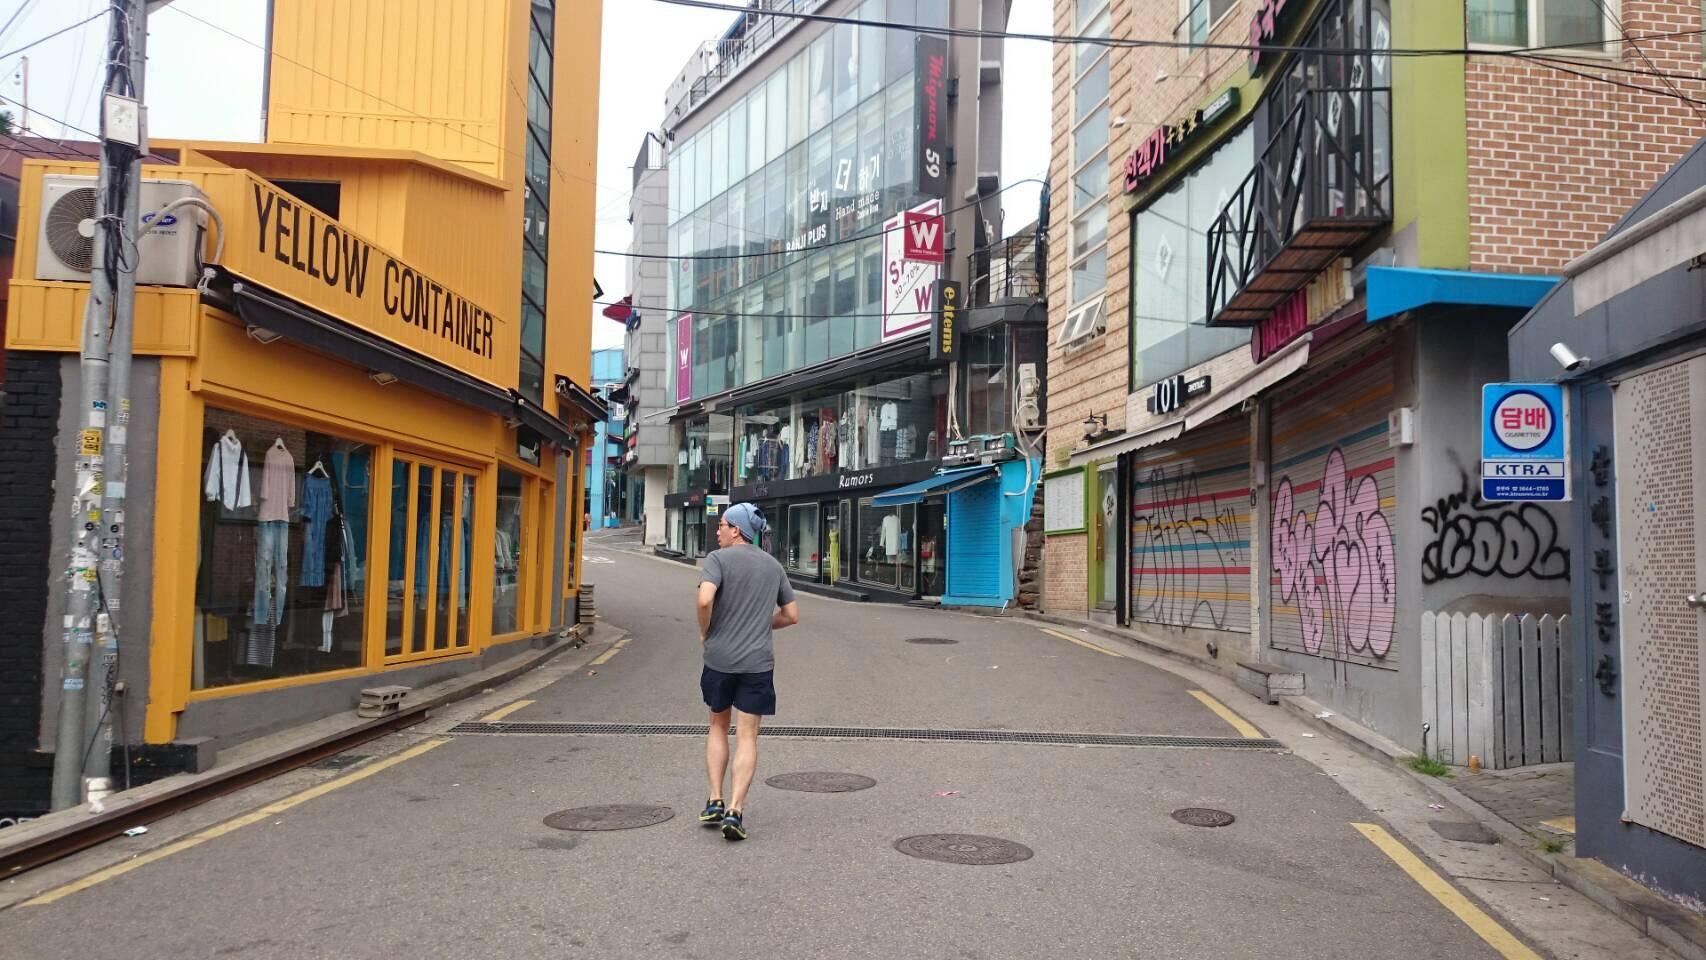 2016.6.16-19 SEOUL TRIP ~食べて呑んで走るソウルの旅~ day3-4_b0219778_22353439.jpg